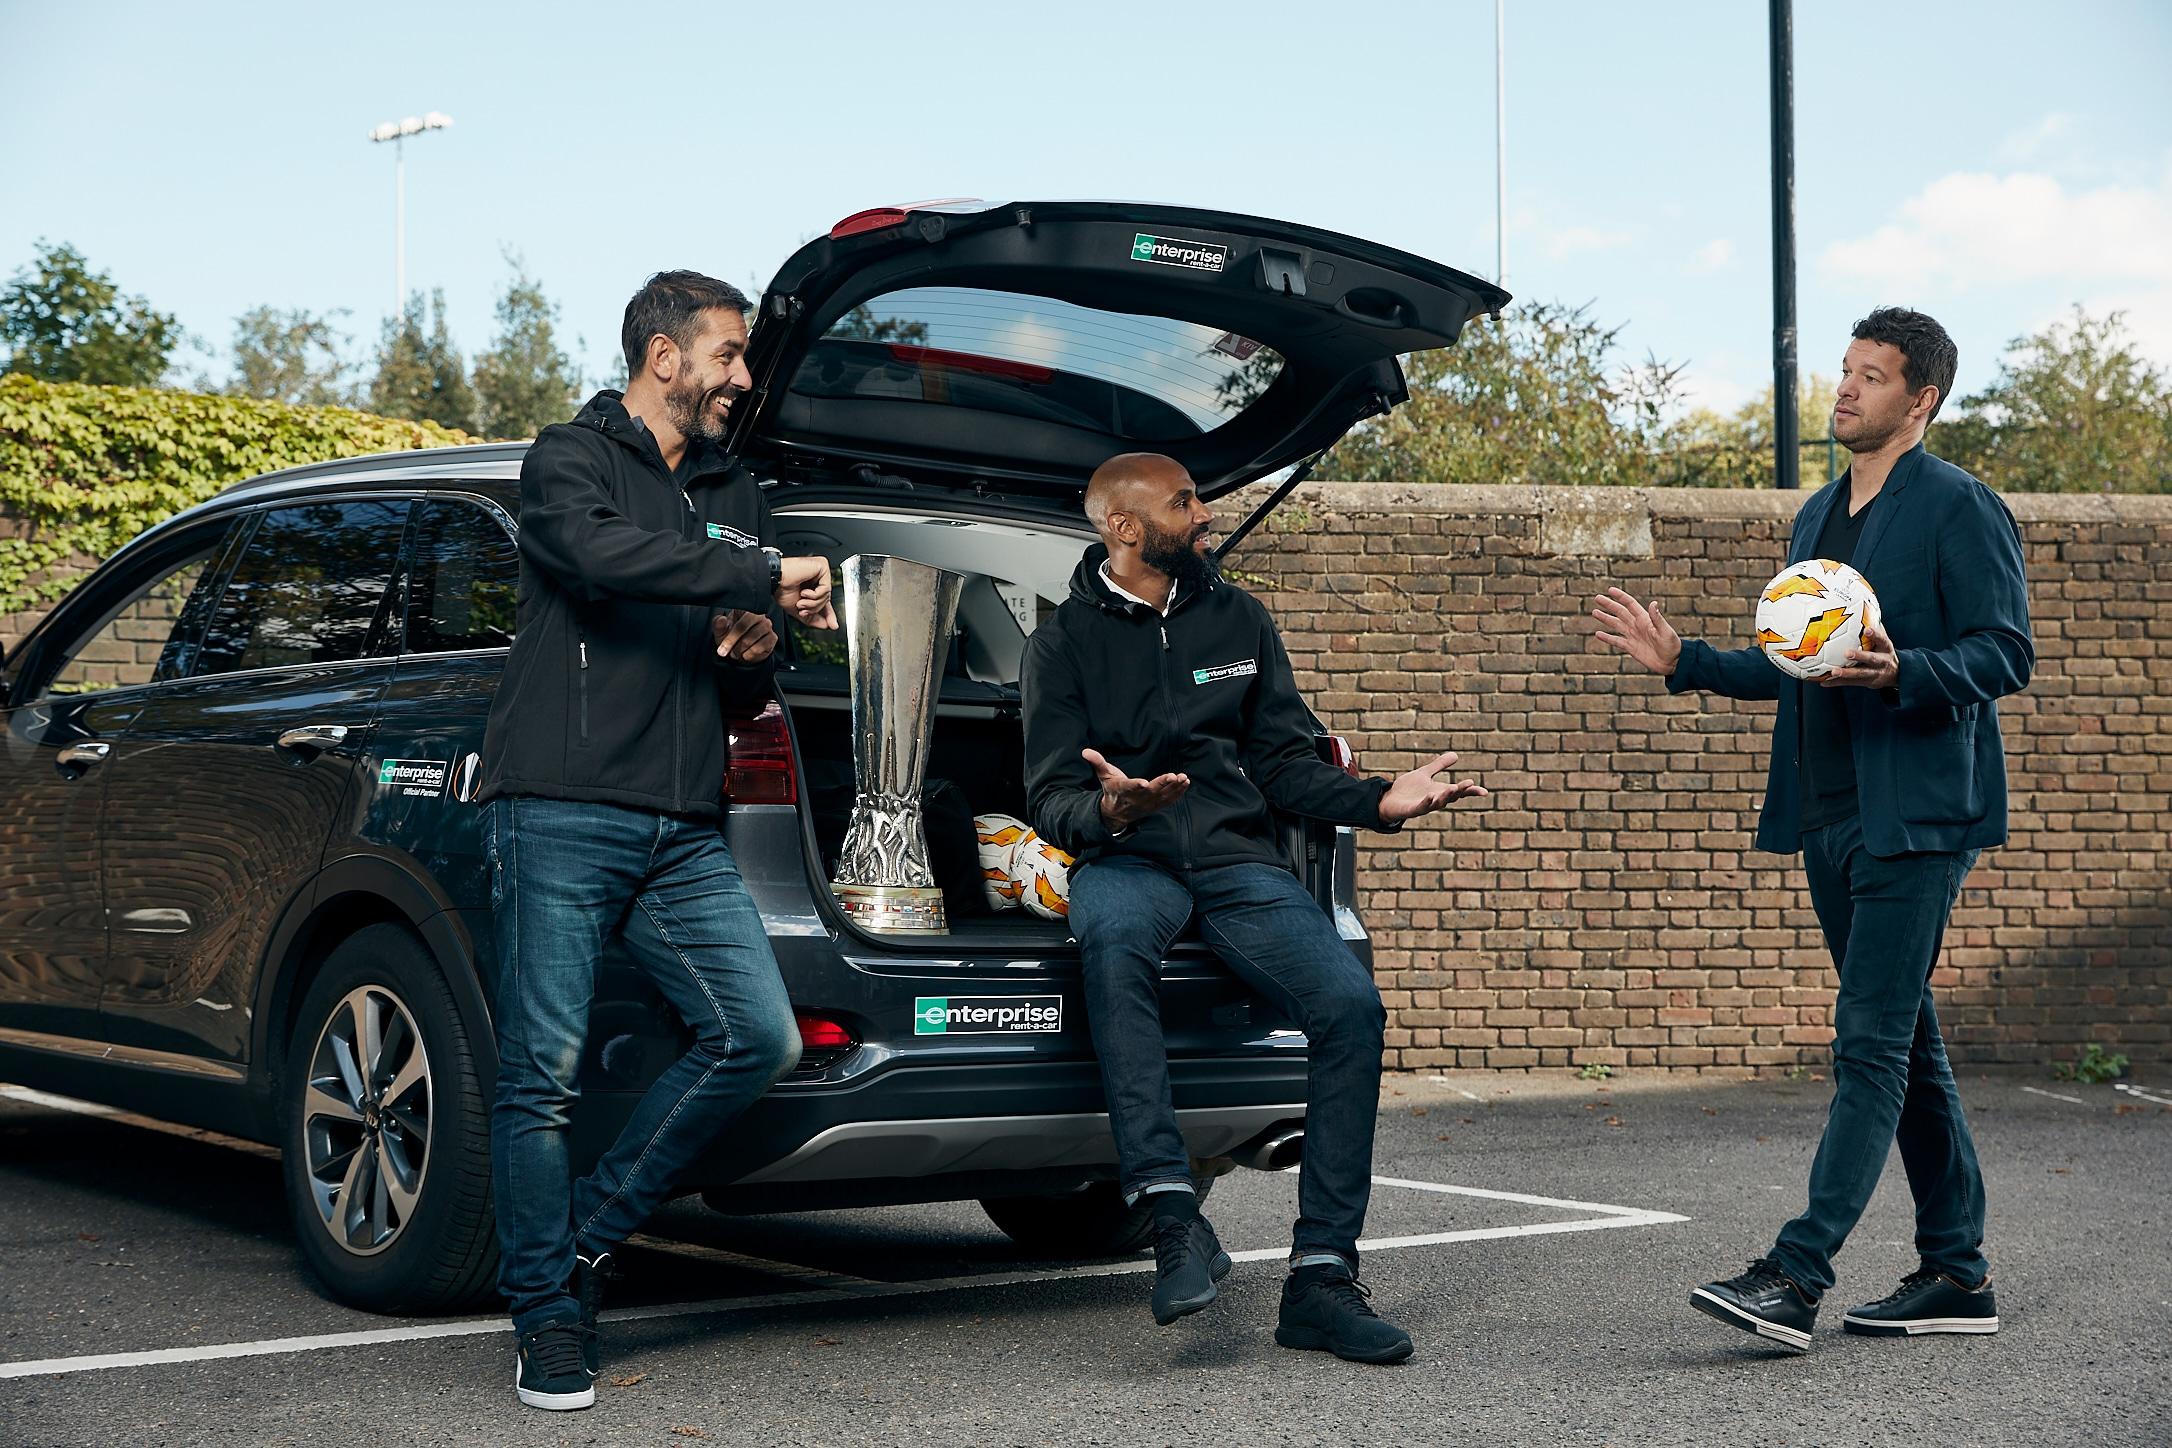 Uefa Sponsorship Enterprise Rent A Car Automotivepictures 4163321994sl2alternatorwirediagram1jpg Legendary Journeys With